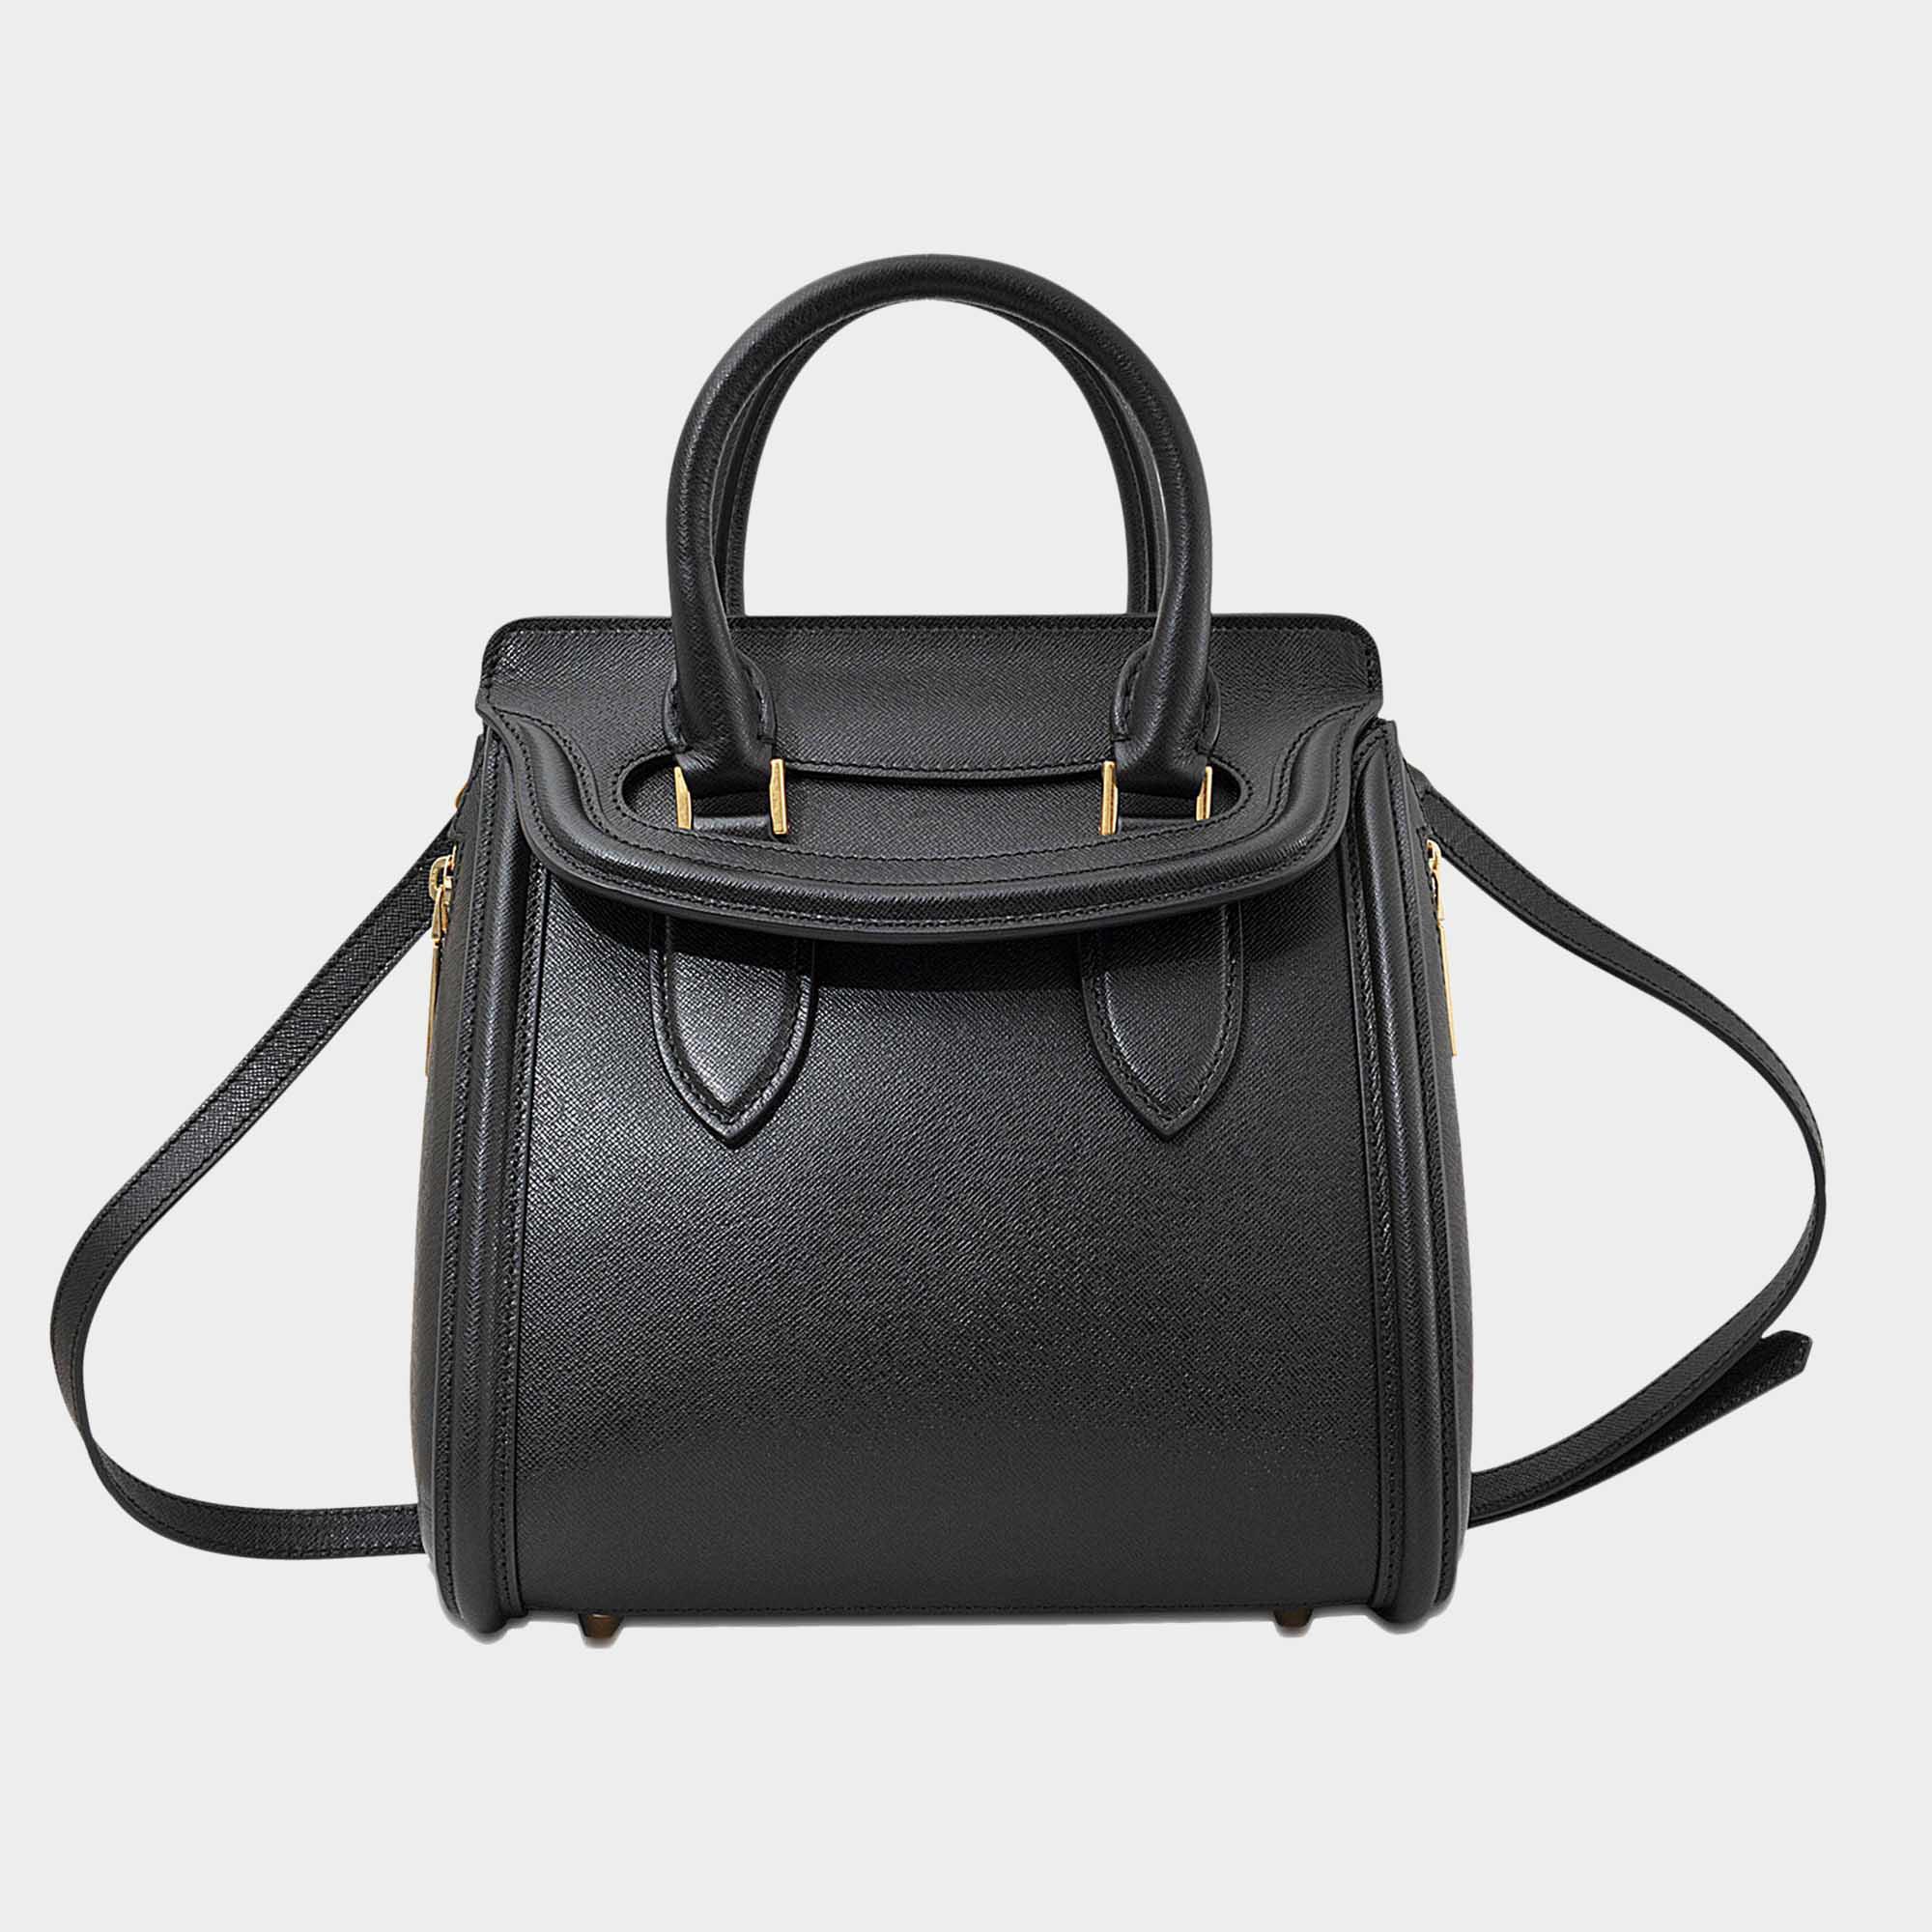 Lyst - Petit sac heroine Alexander McQueen en coloris Noir 8d829f9da12